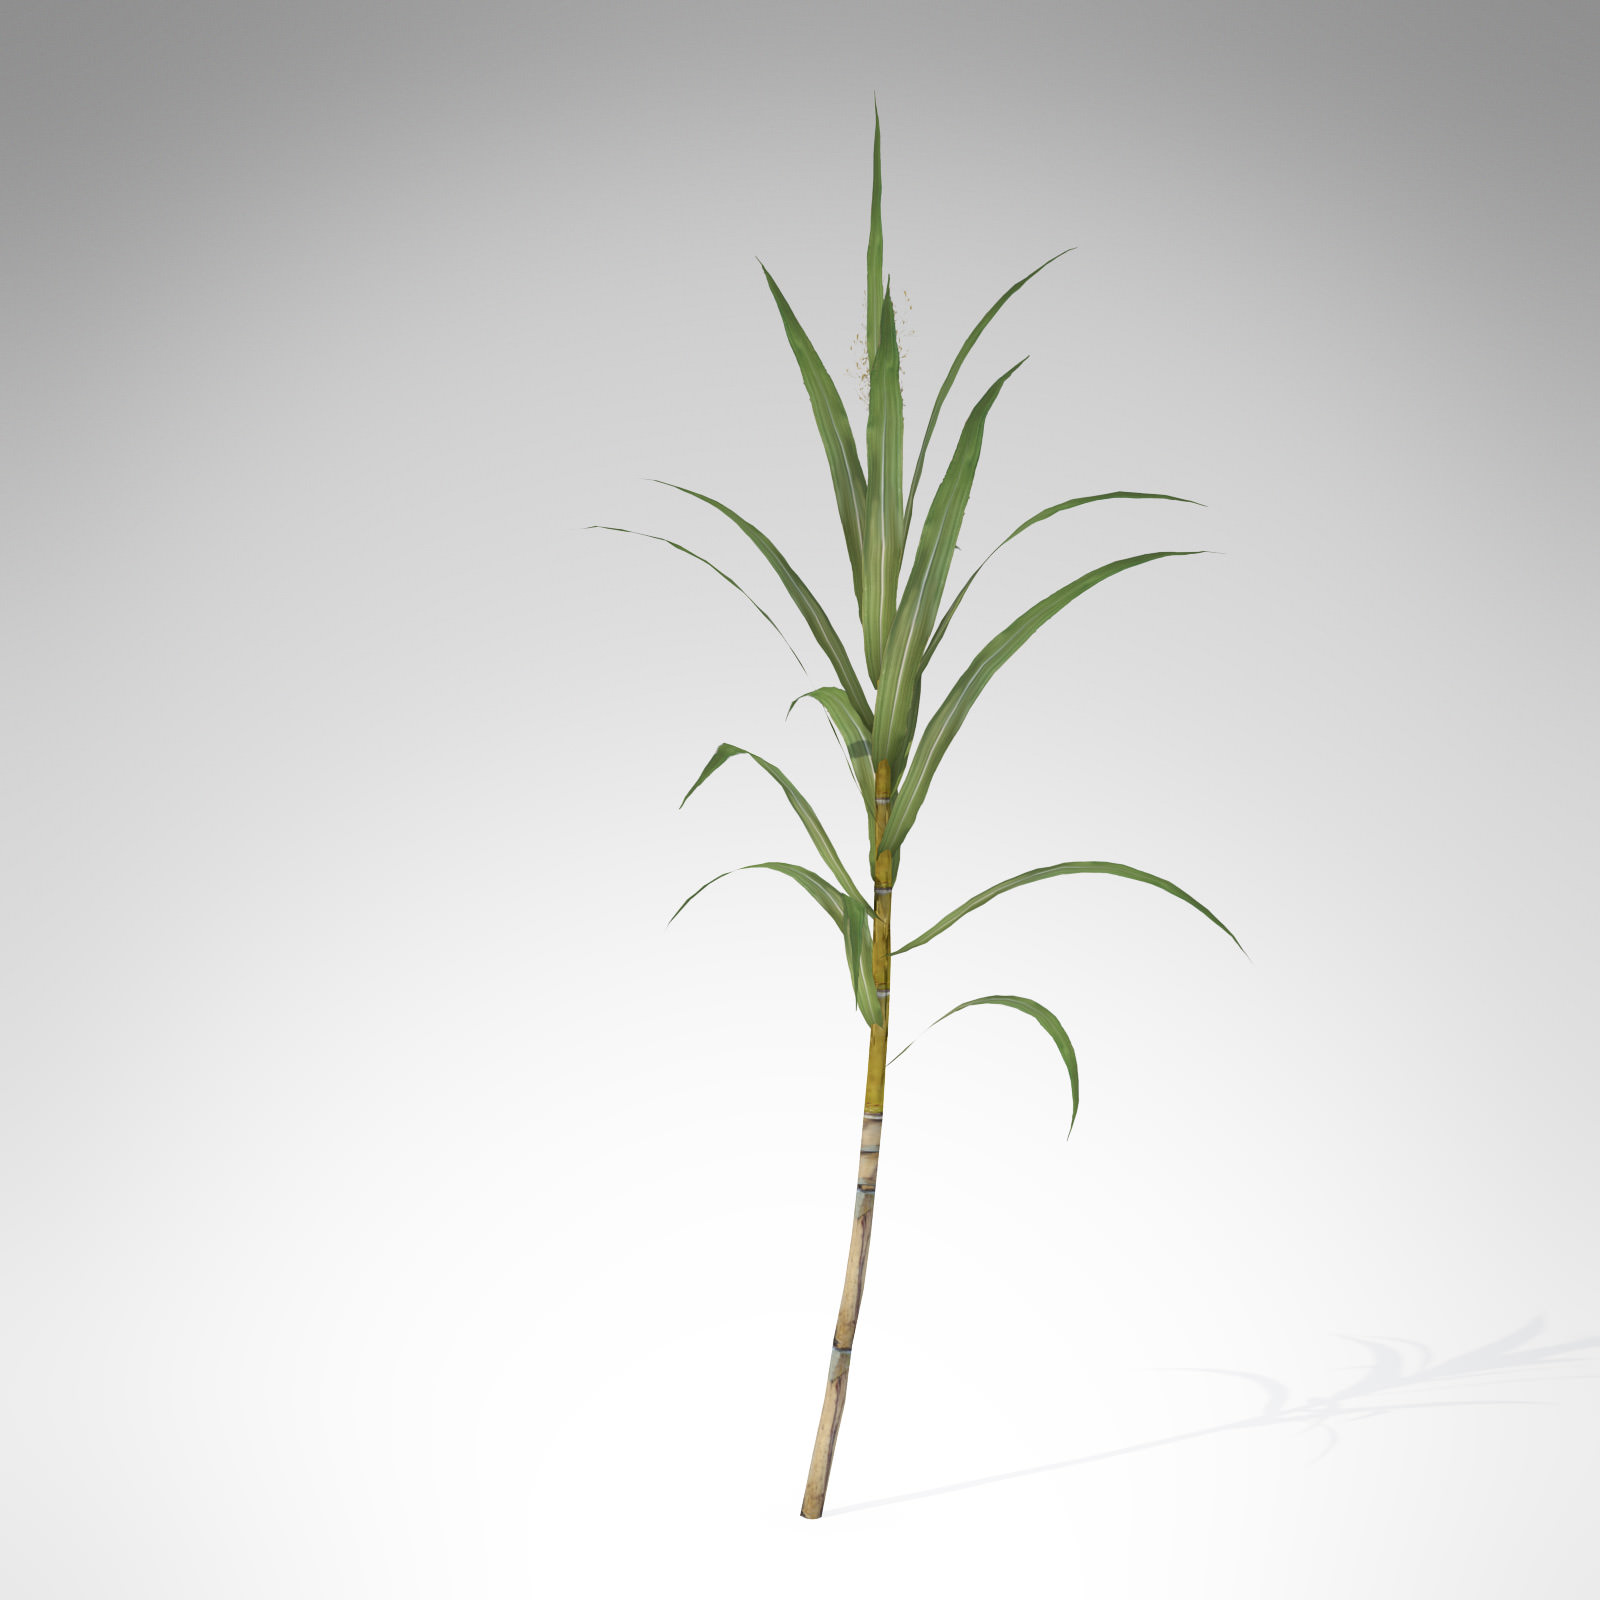 Free Sugarcane Cliparts, Download Free Clip Art, Free Clip.